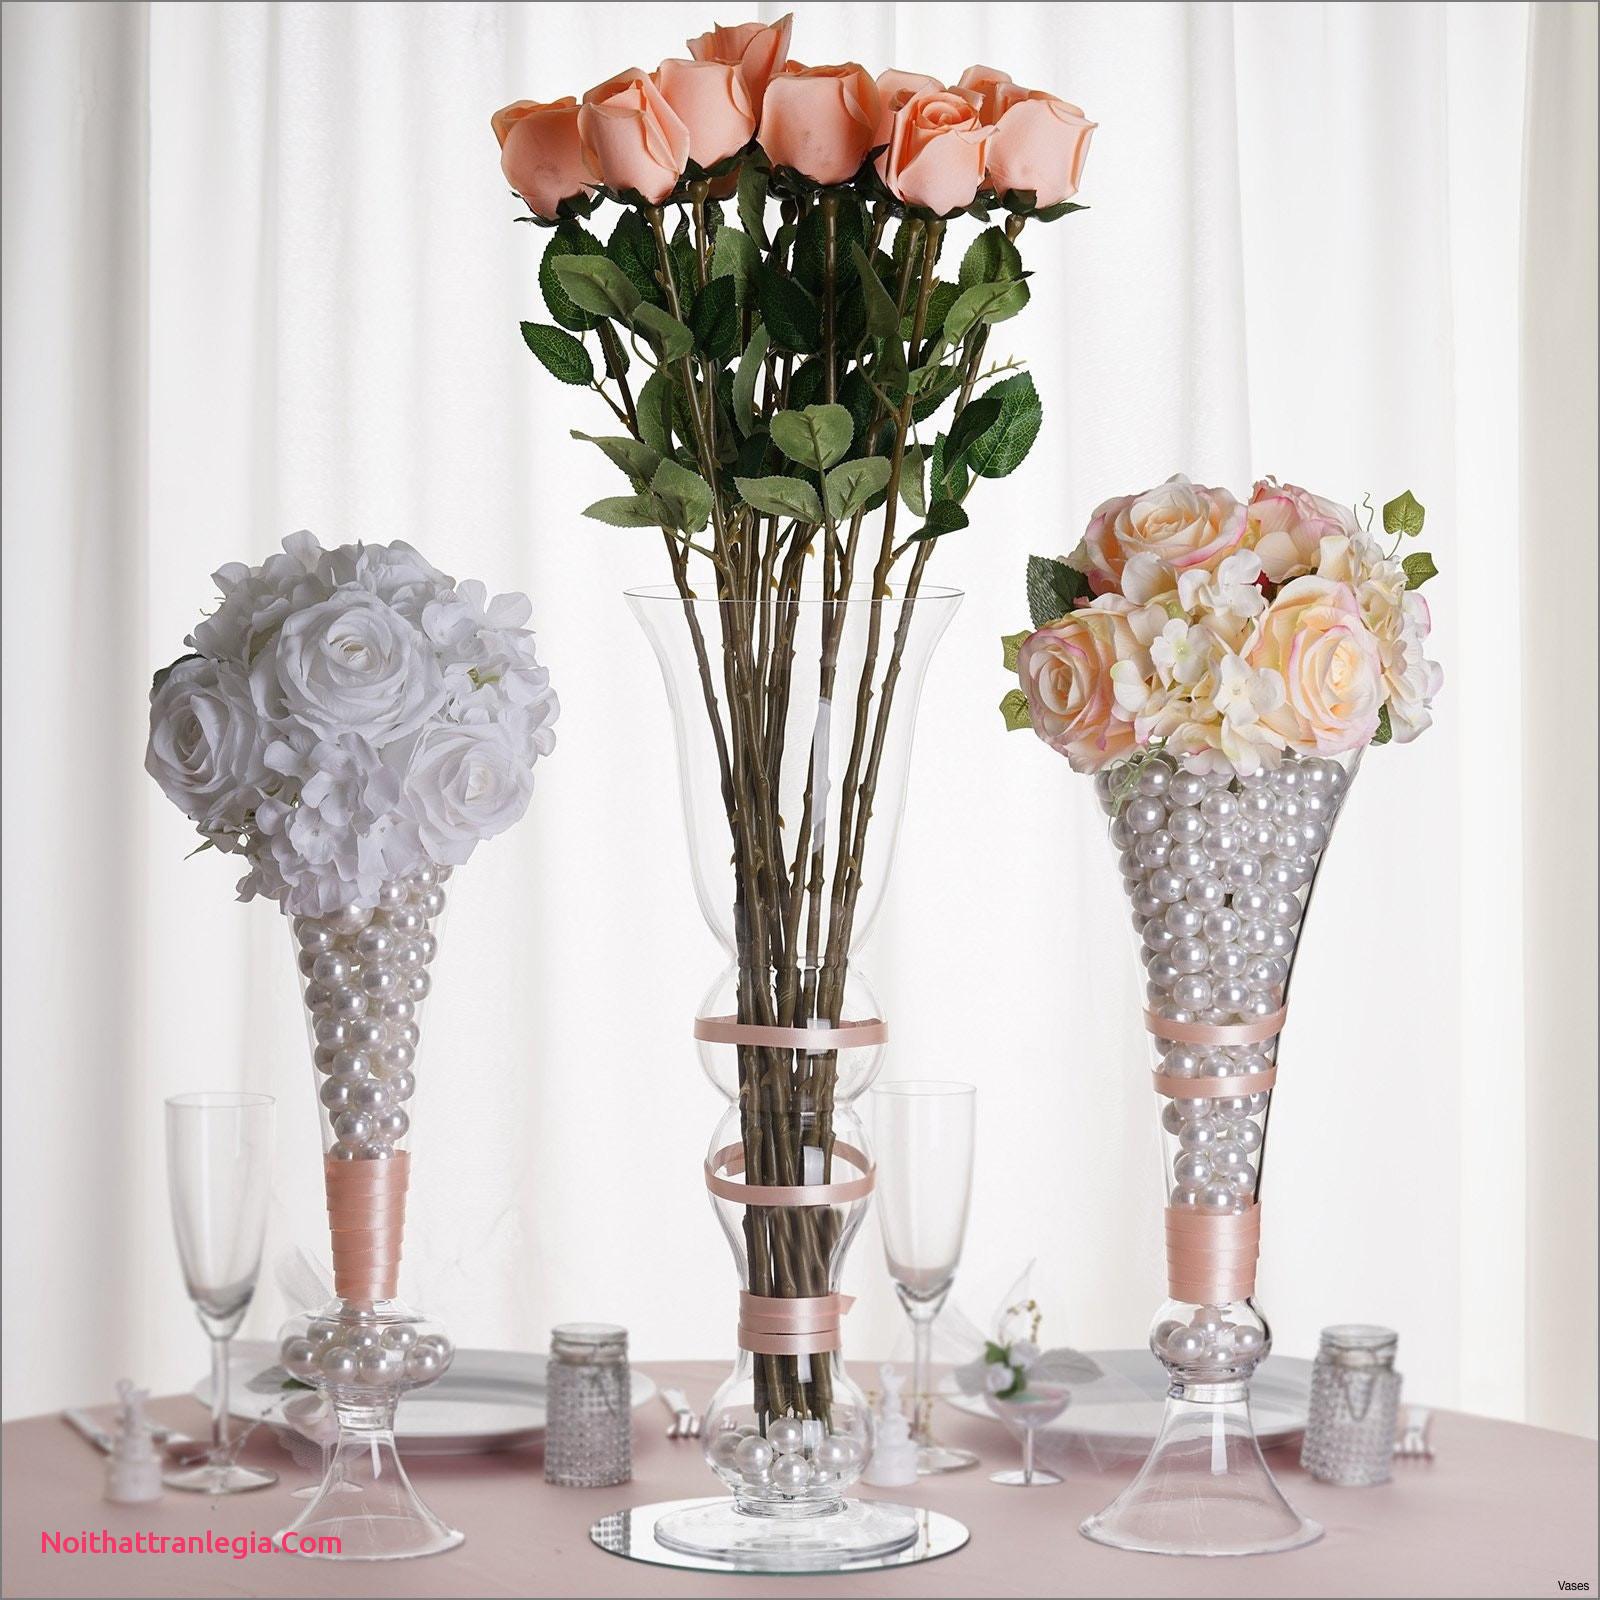 big glass vase of 20 how to clean flower vases noithattranlegia vases design in update clipart awesome flower vase table 04h vases tablei 0d clipart dining base end design